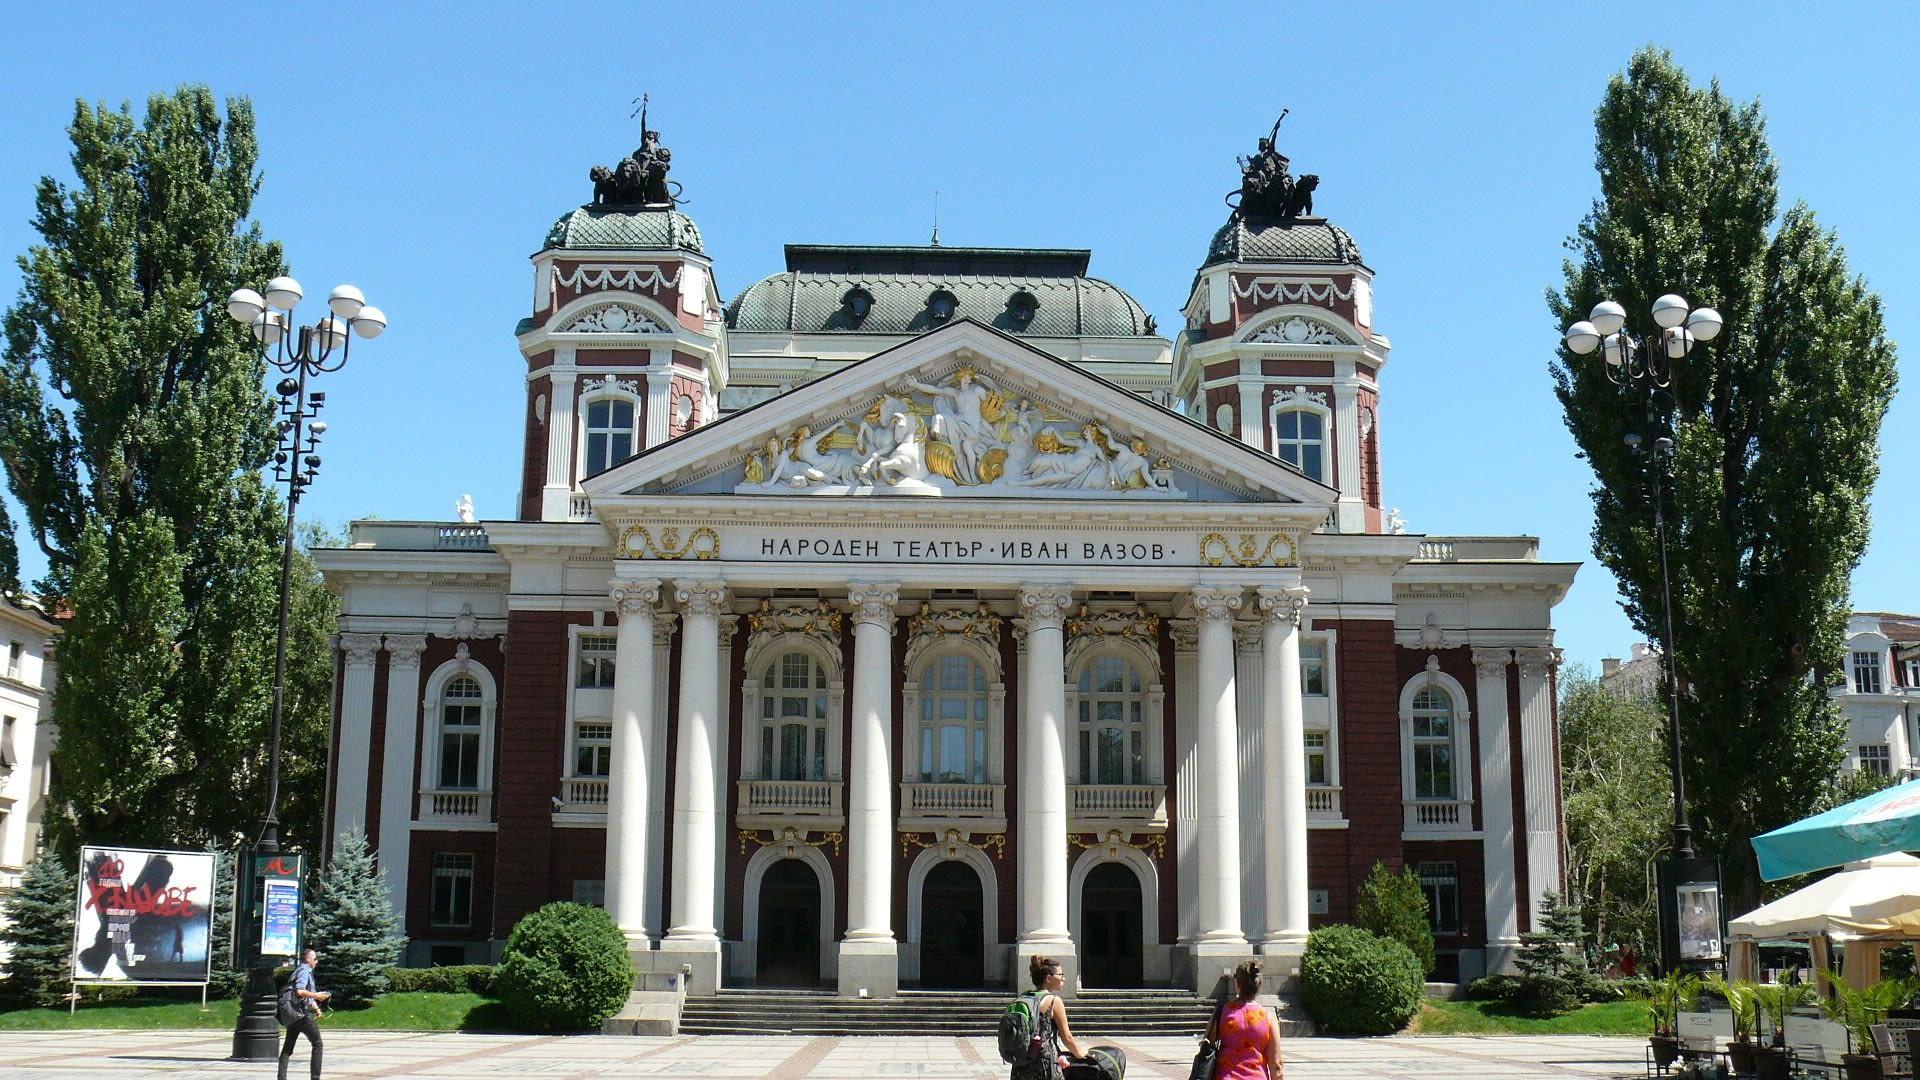 Bulgaria & Romania Highlights Tours 2019 - 2020 -  National Theatre Bulgaria